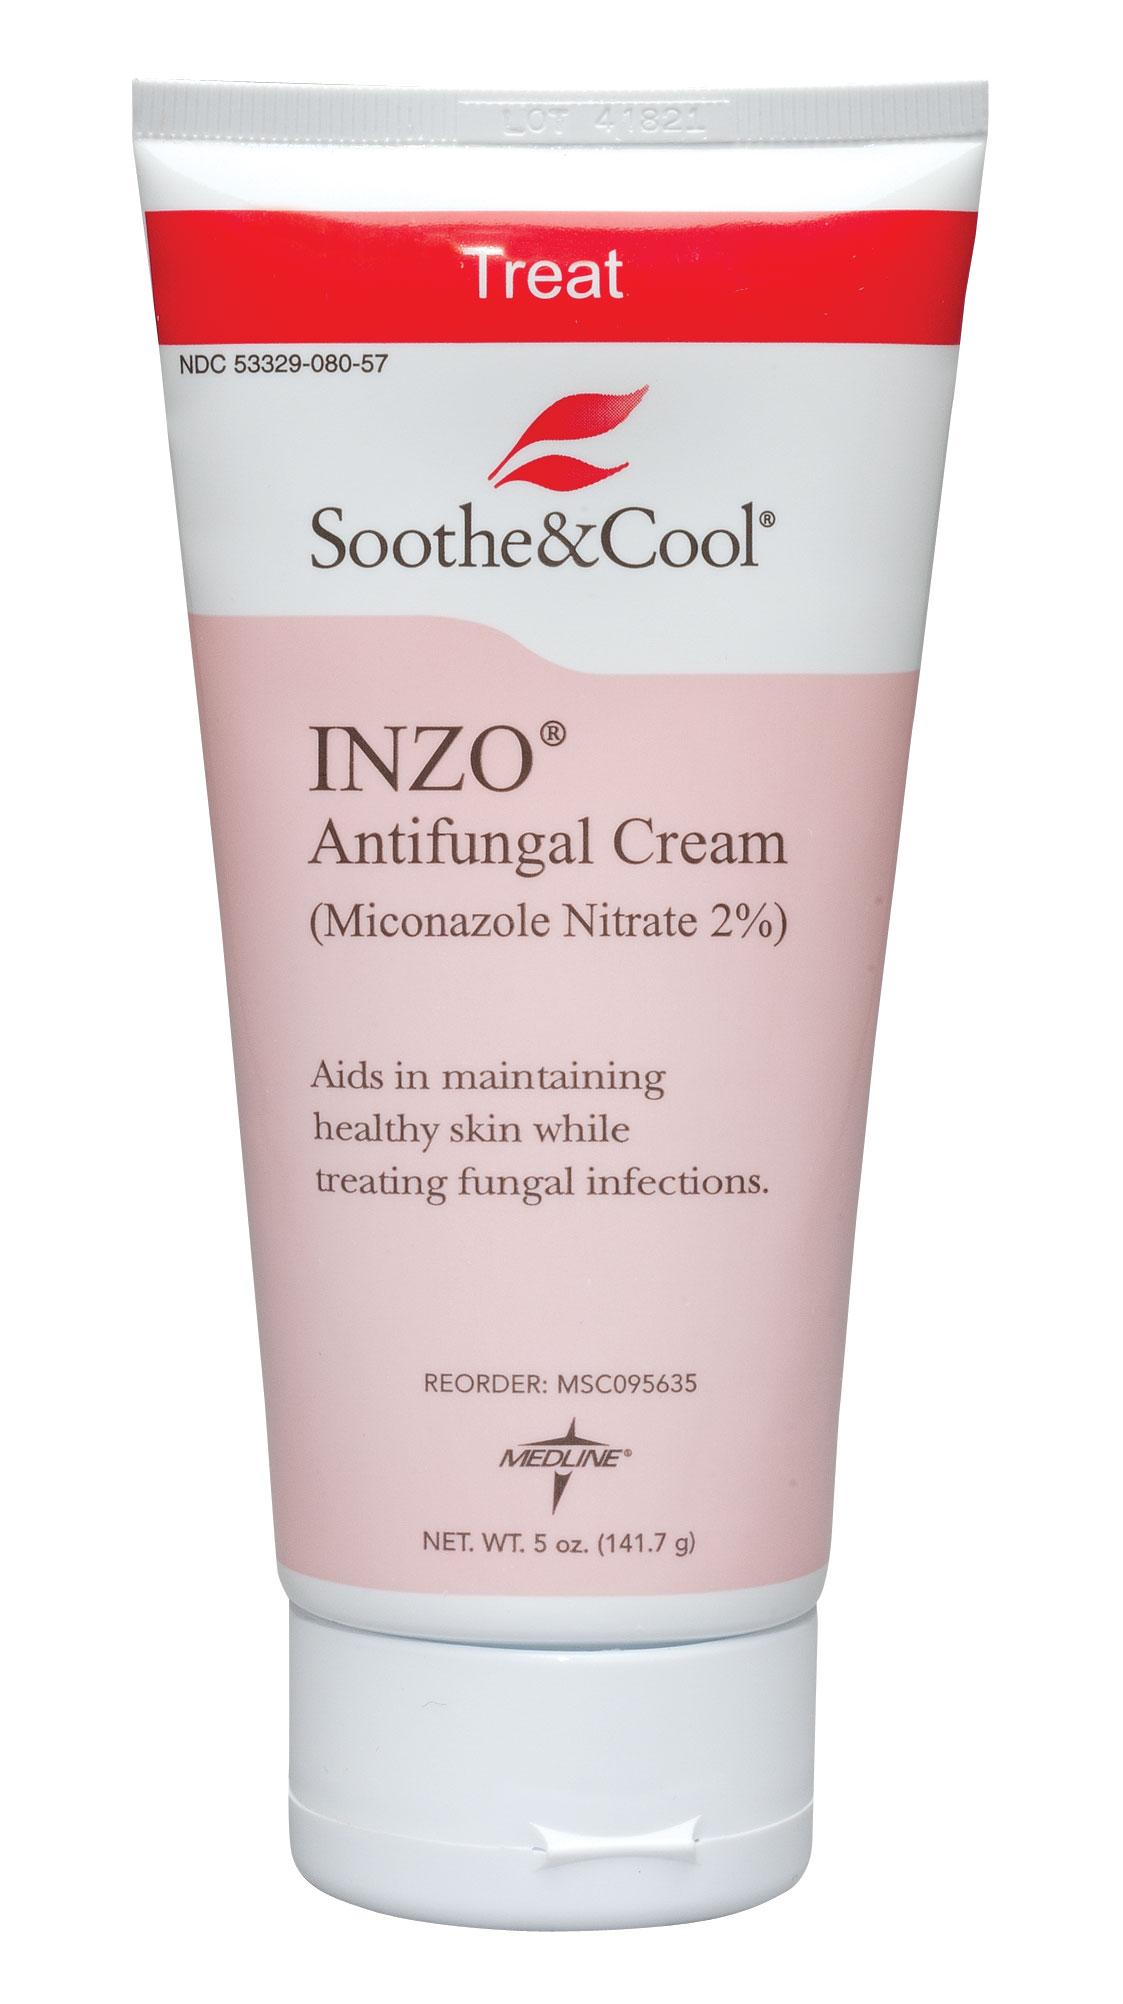 Soothe & Cool Antifungal Cream - 2 oz.